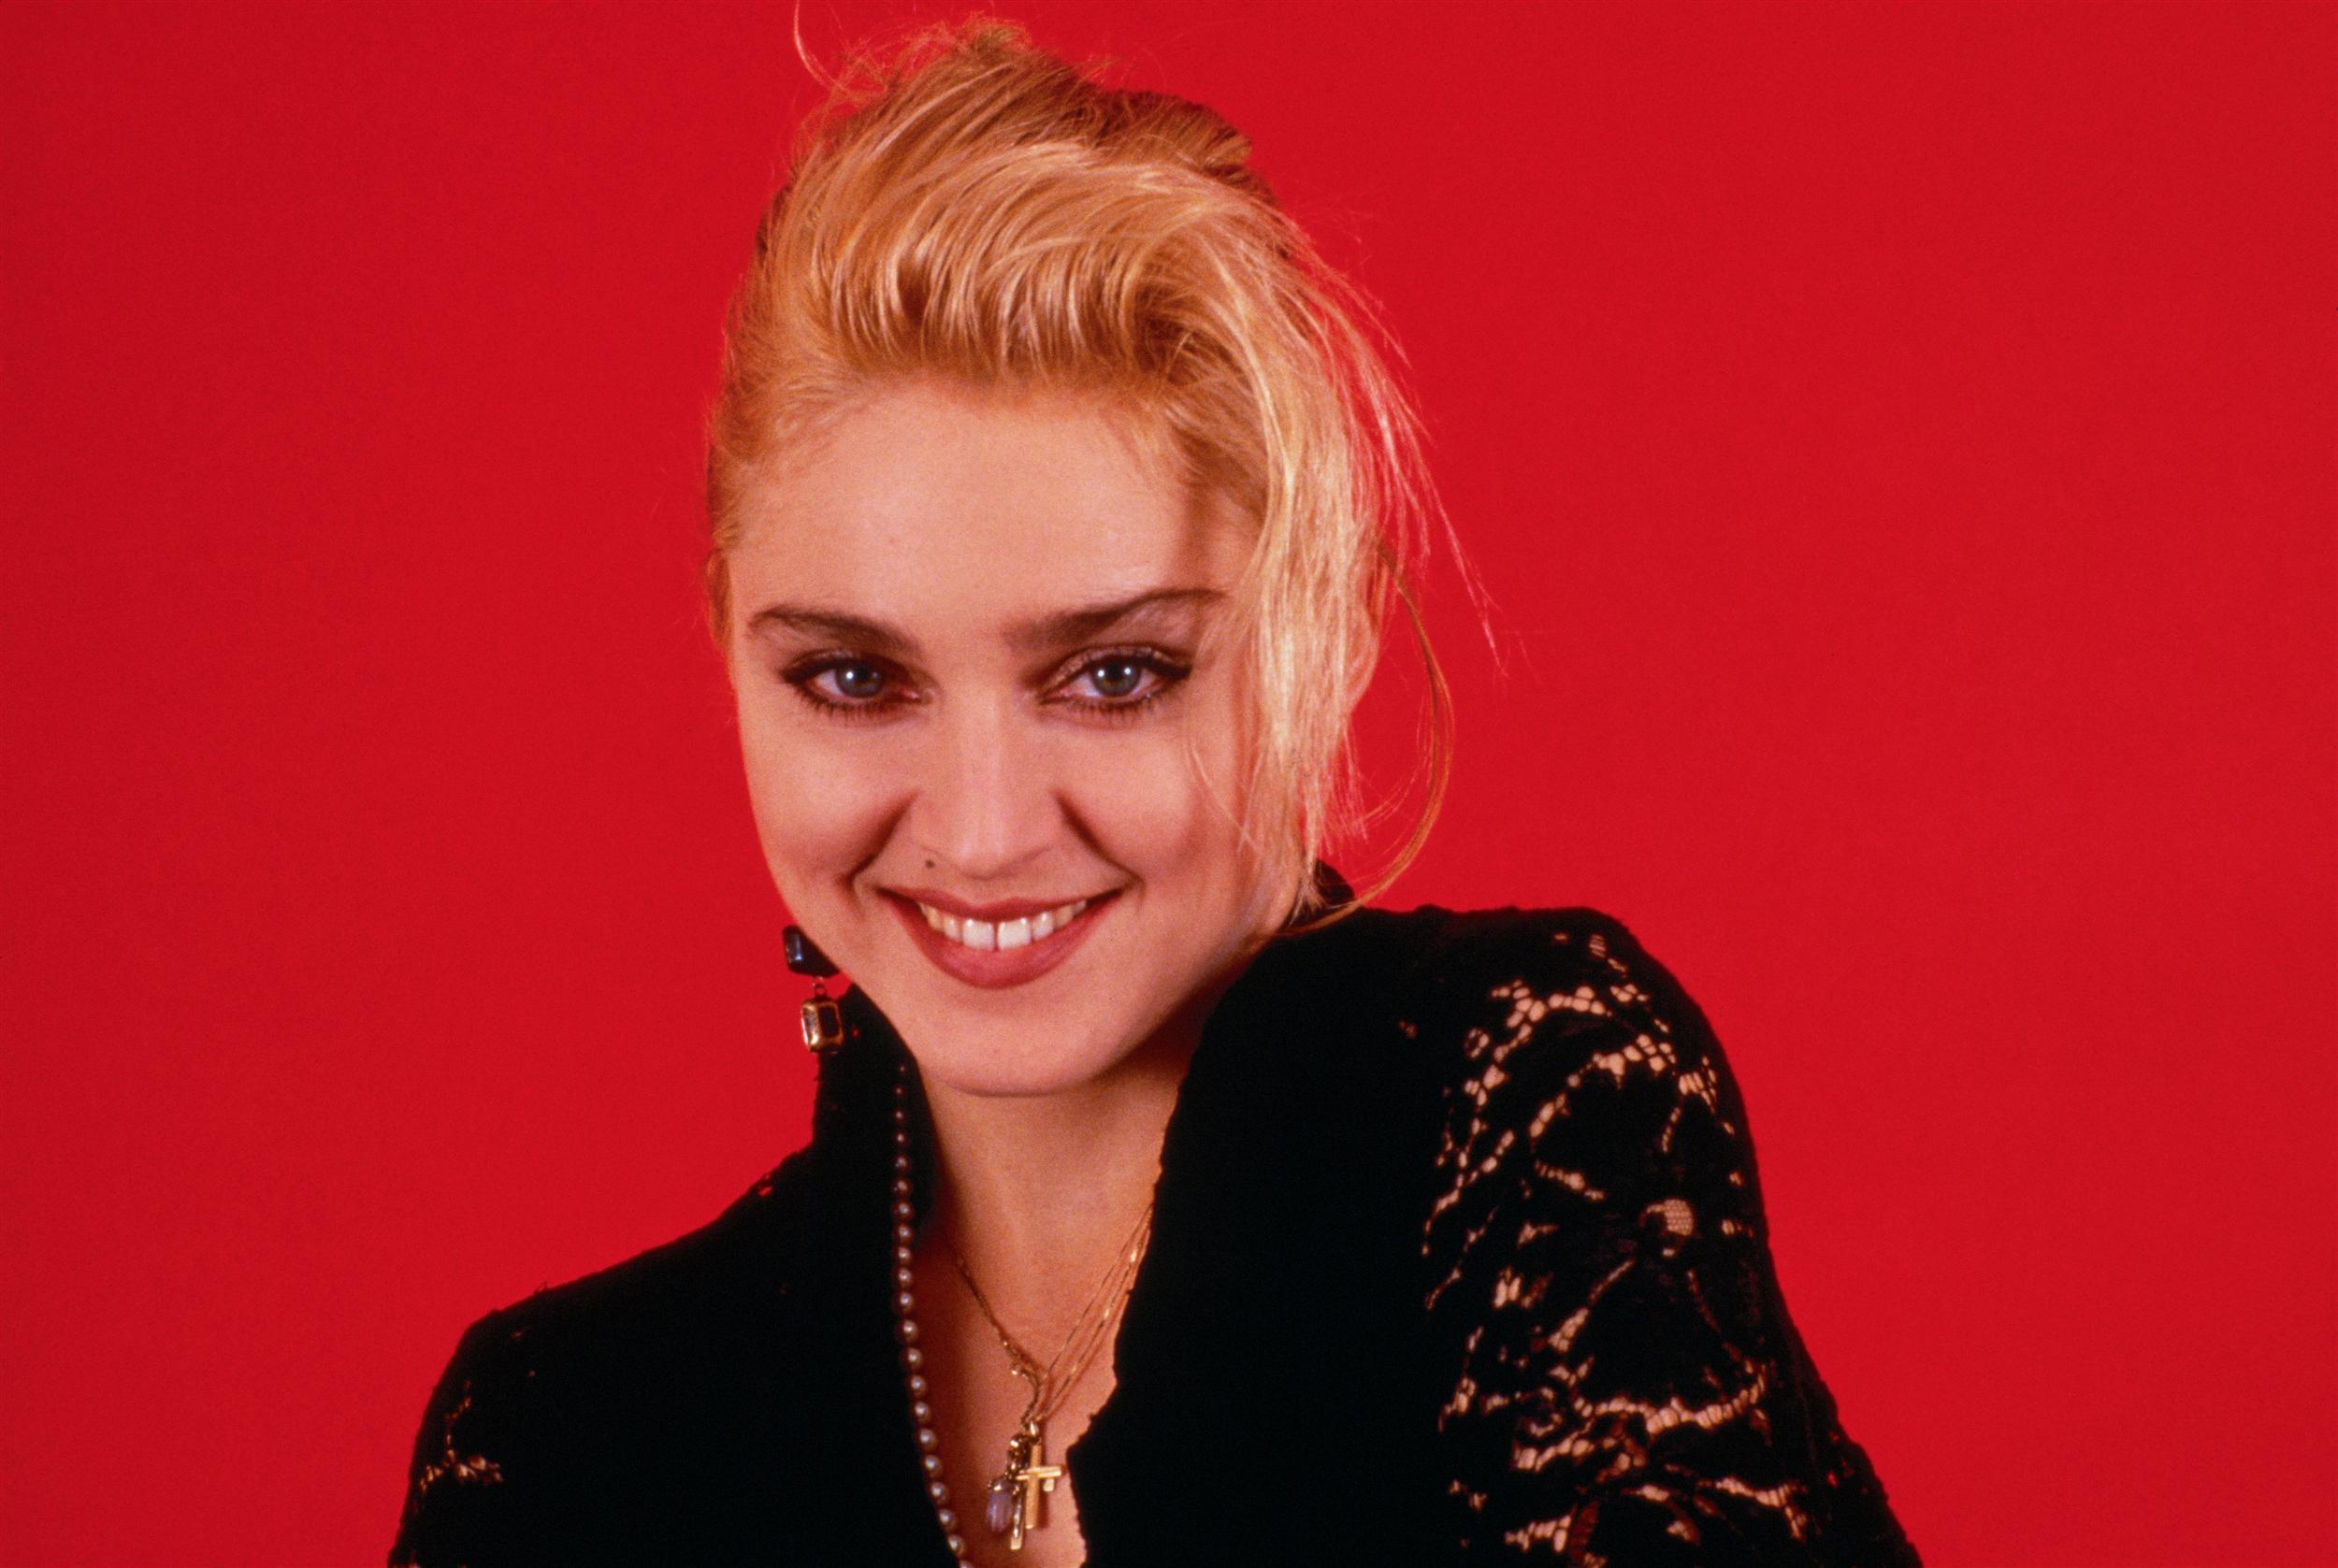 Мадонна (Madonna), биография